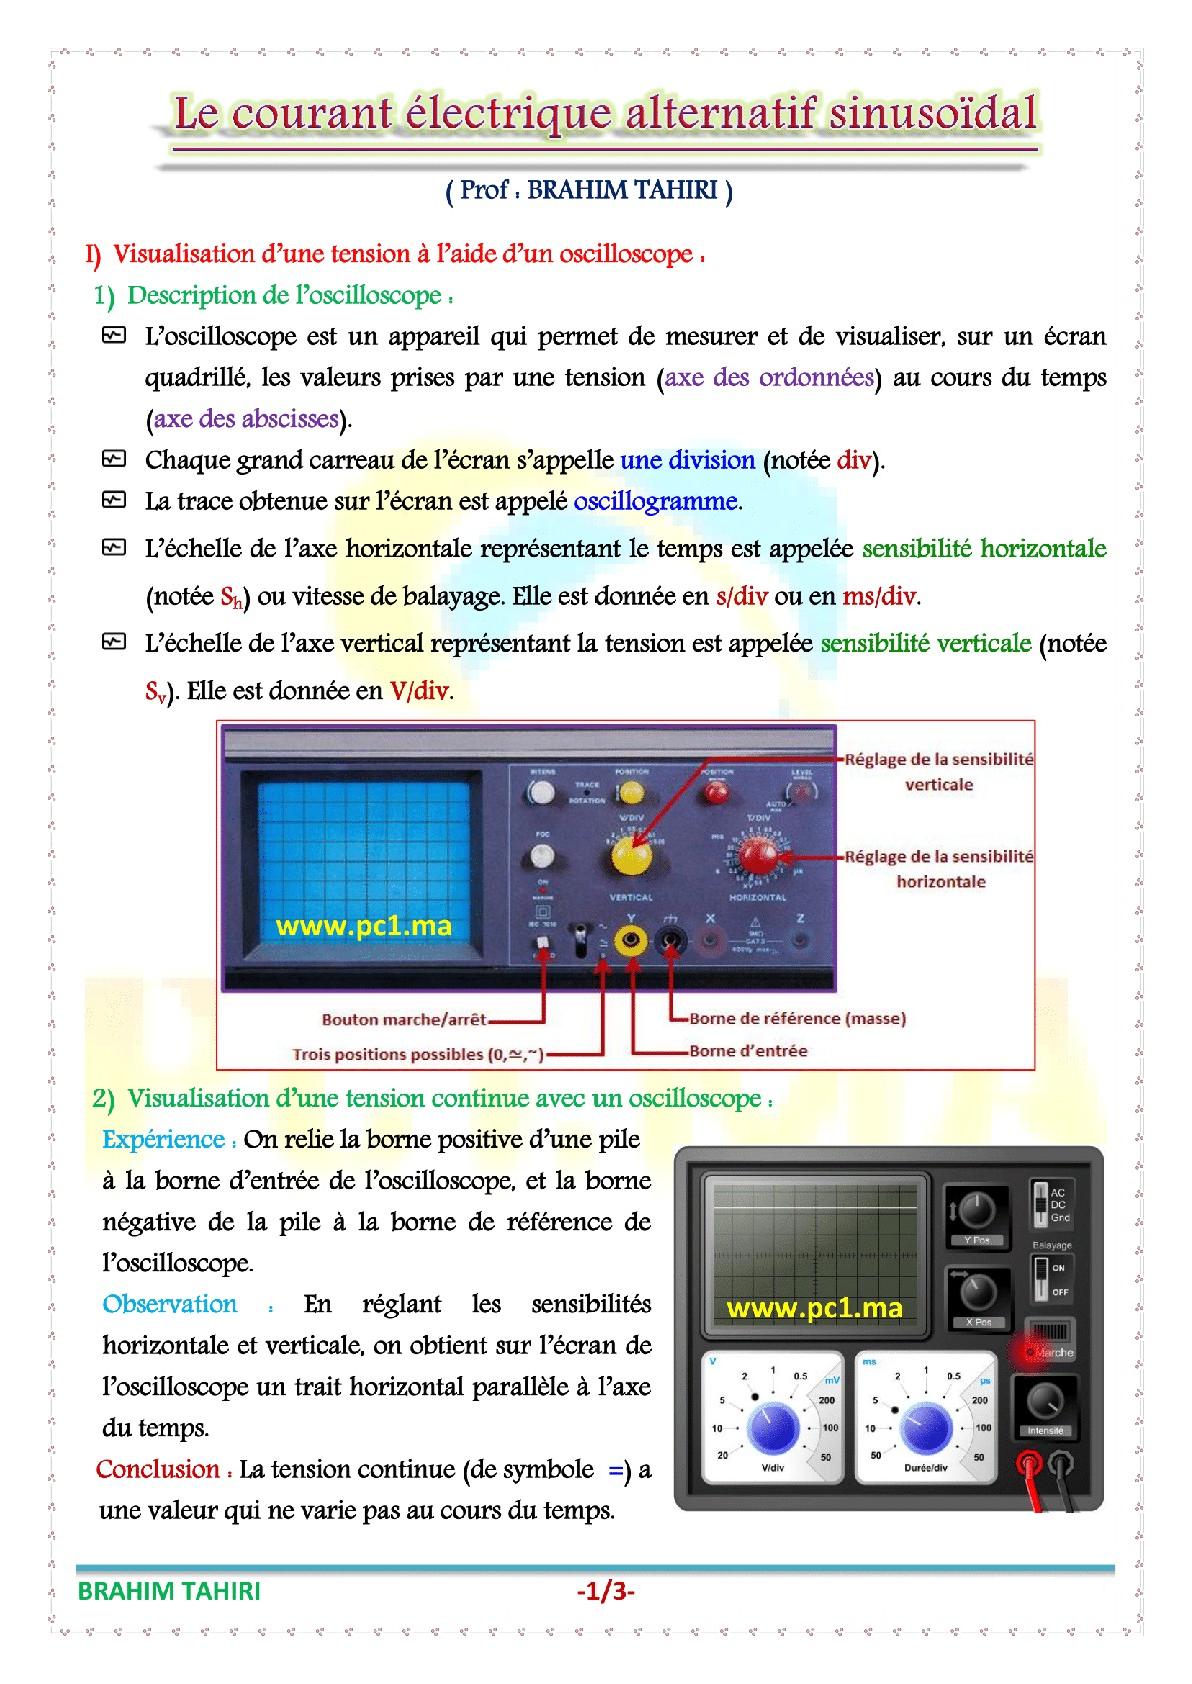 درس Le courant électrique alternatif sinusoïdal للسنة الثانية اعدادي